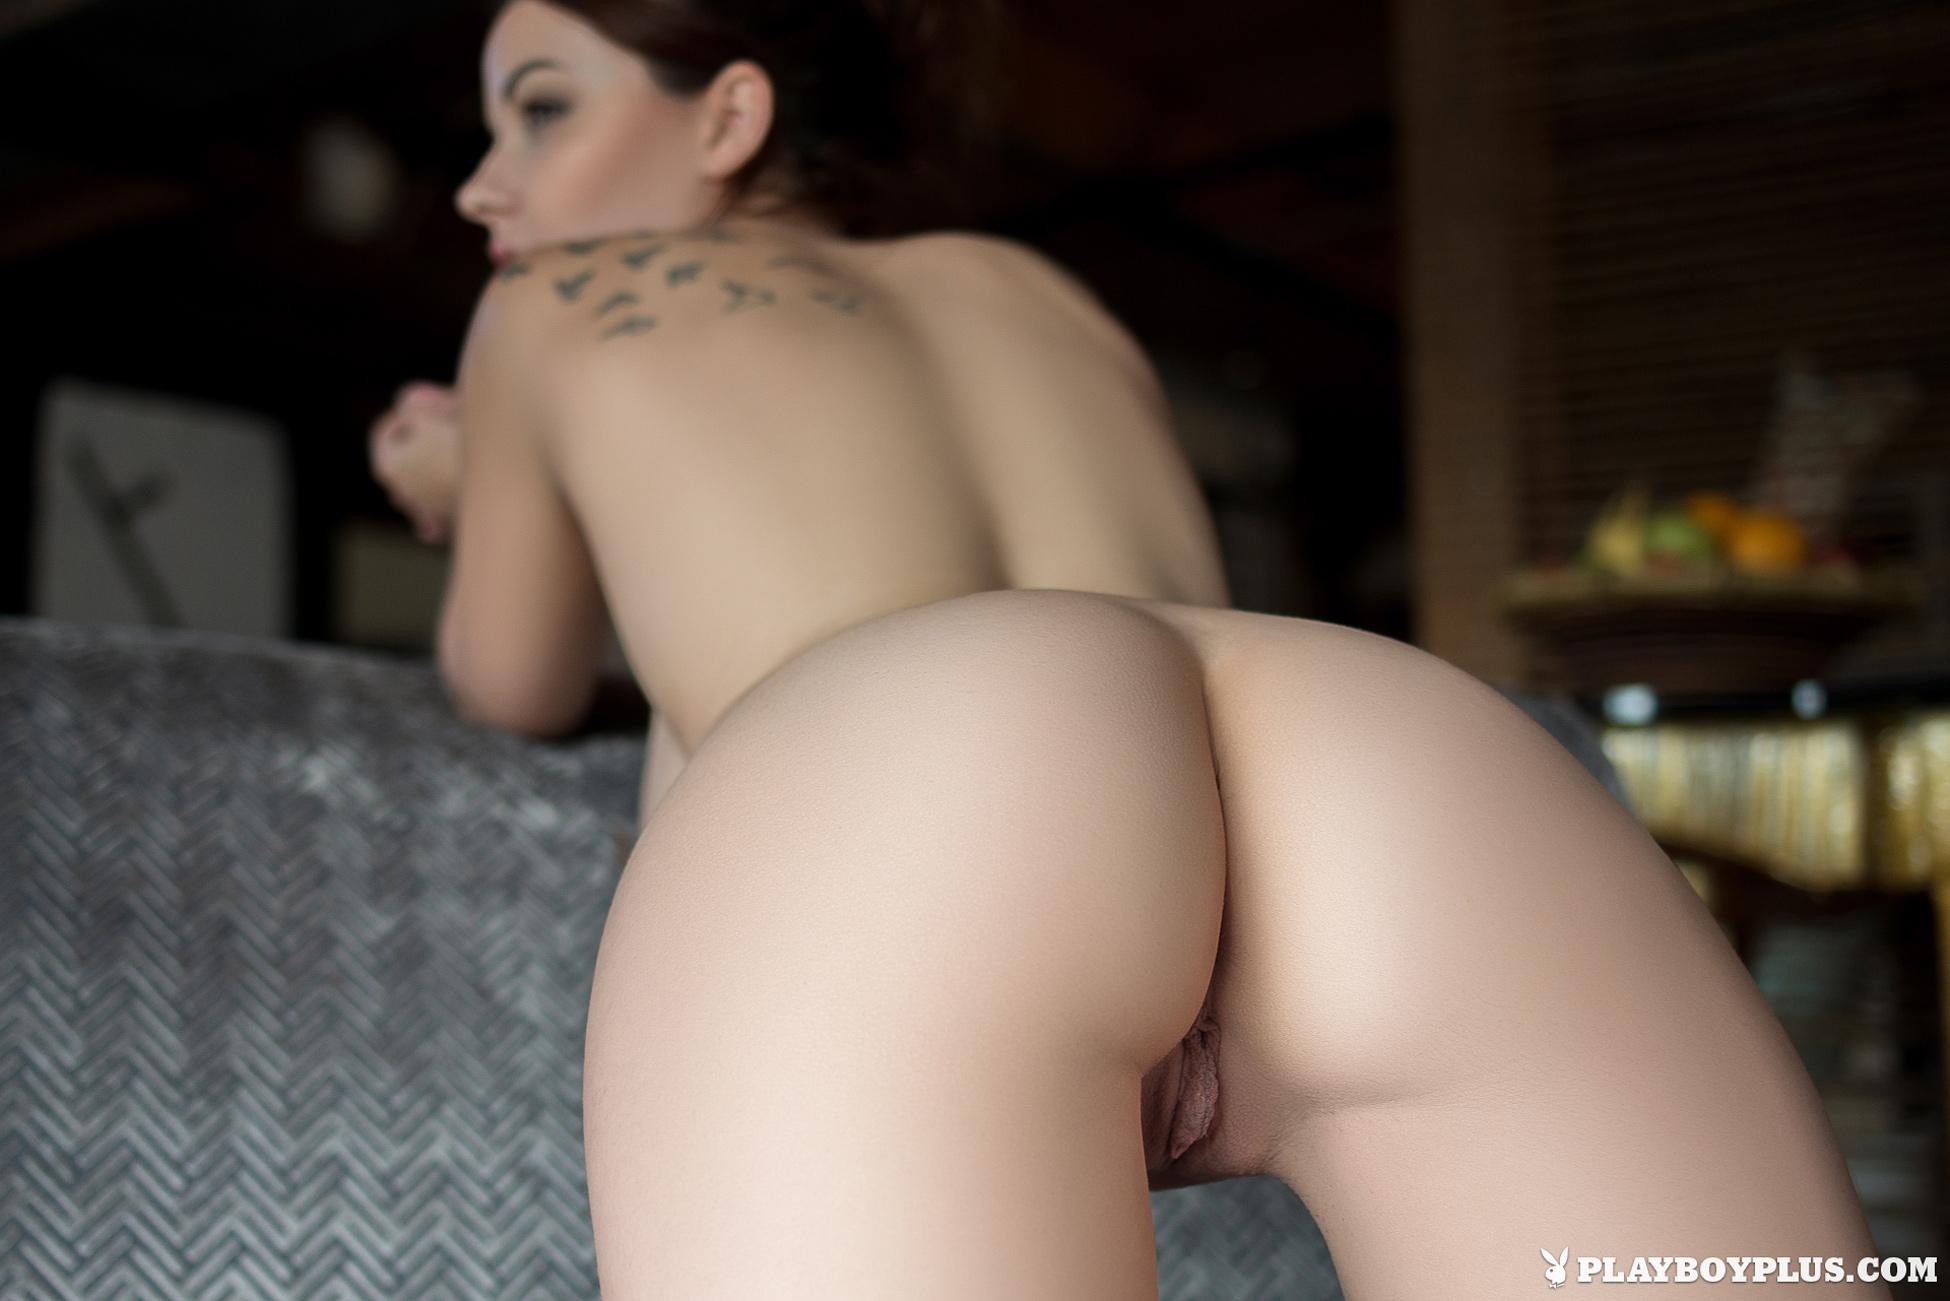 elizabeth-marxs-boobs-sofa-naked-playboy-24